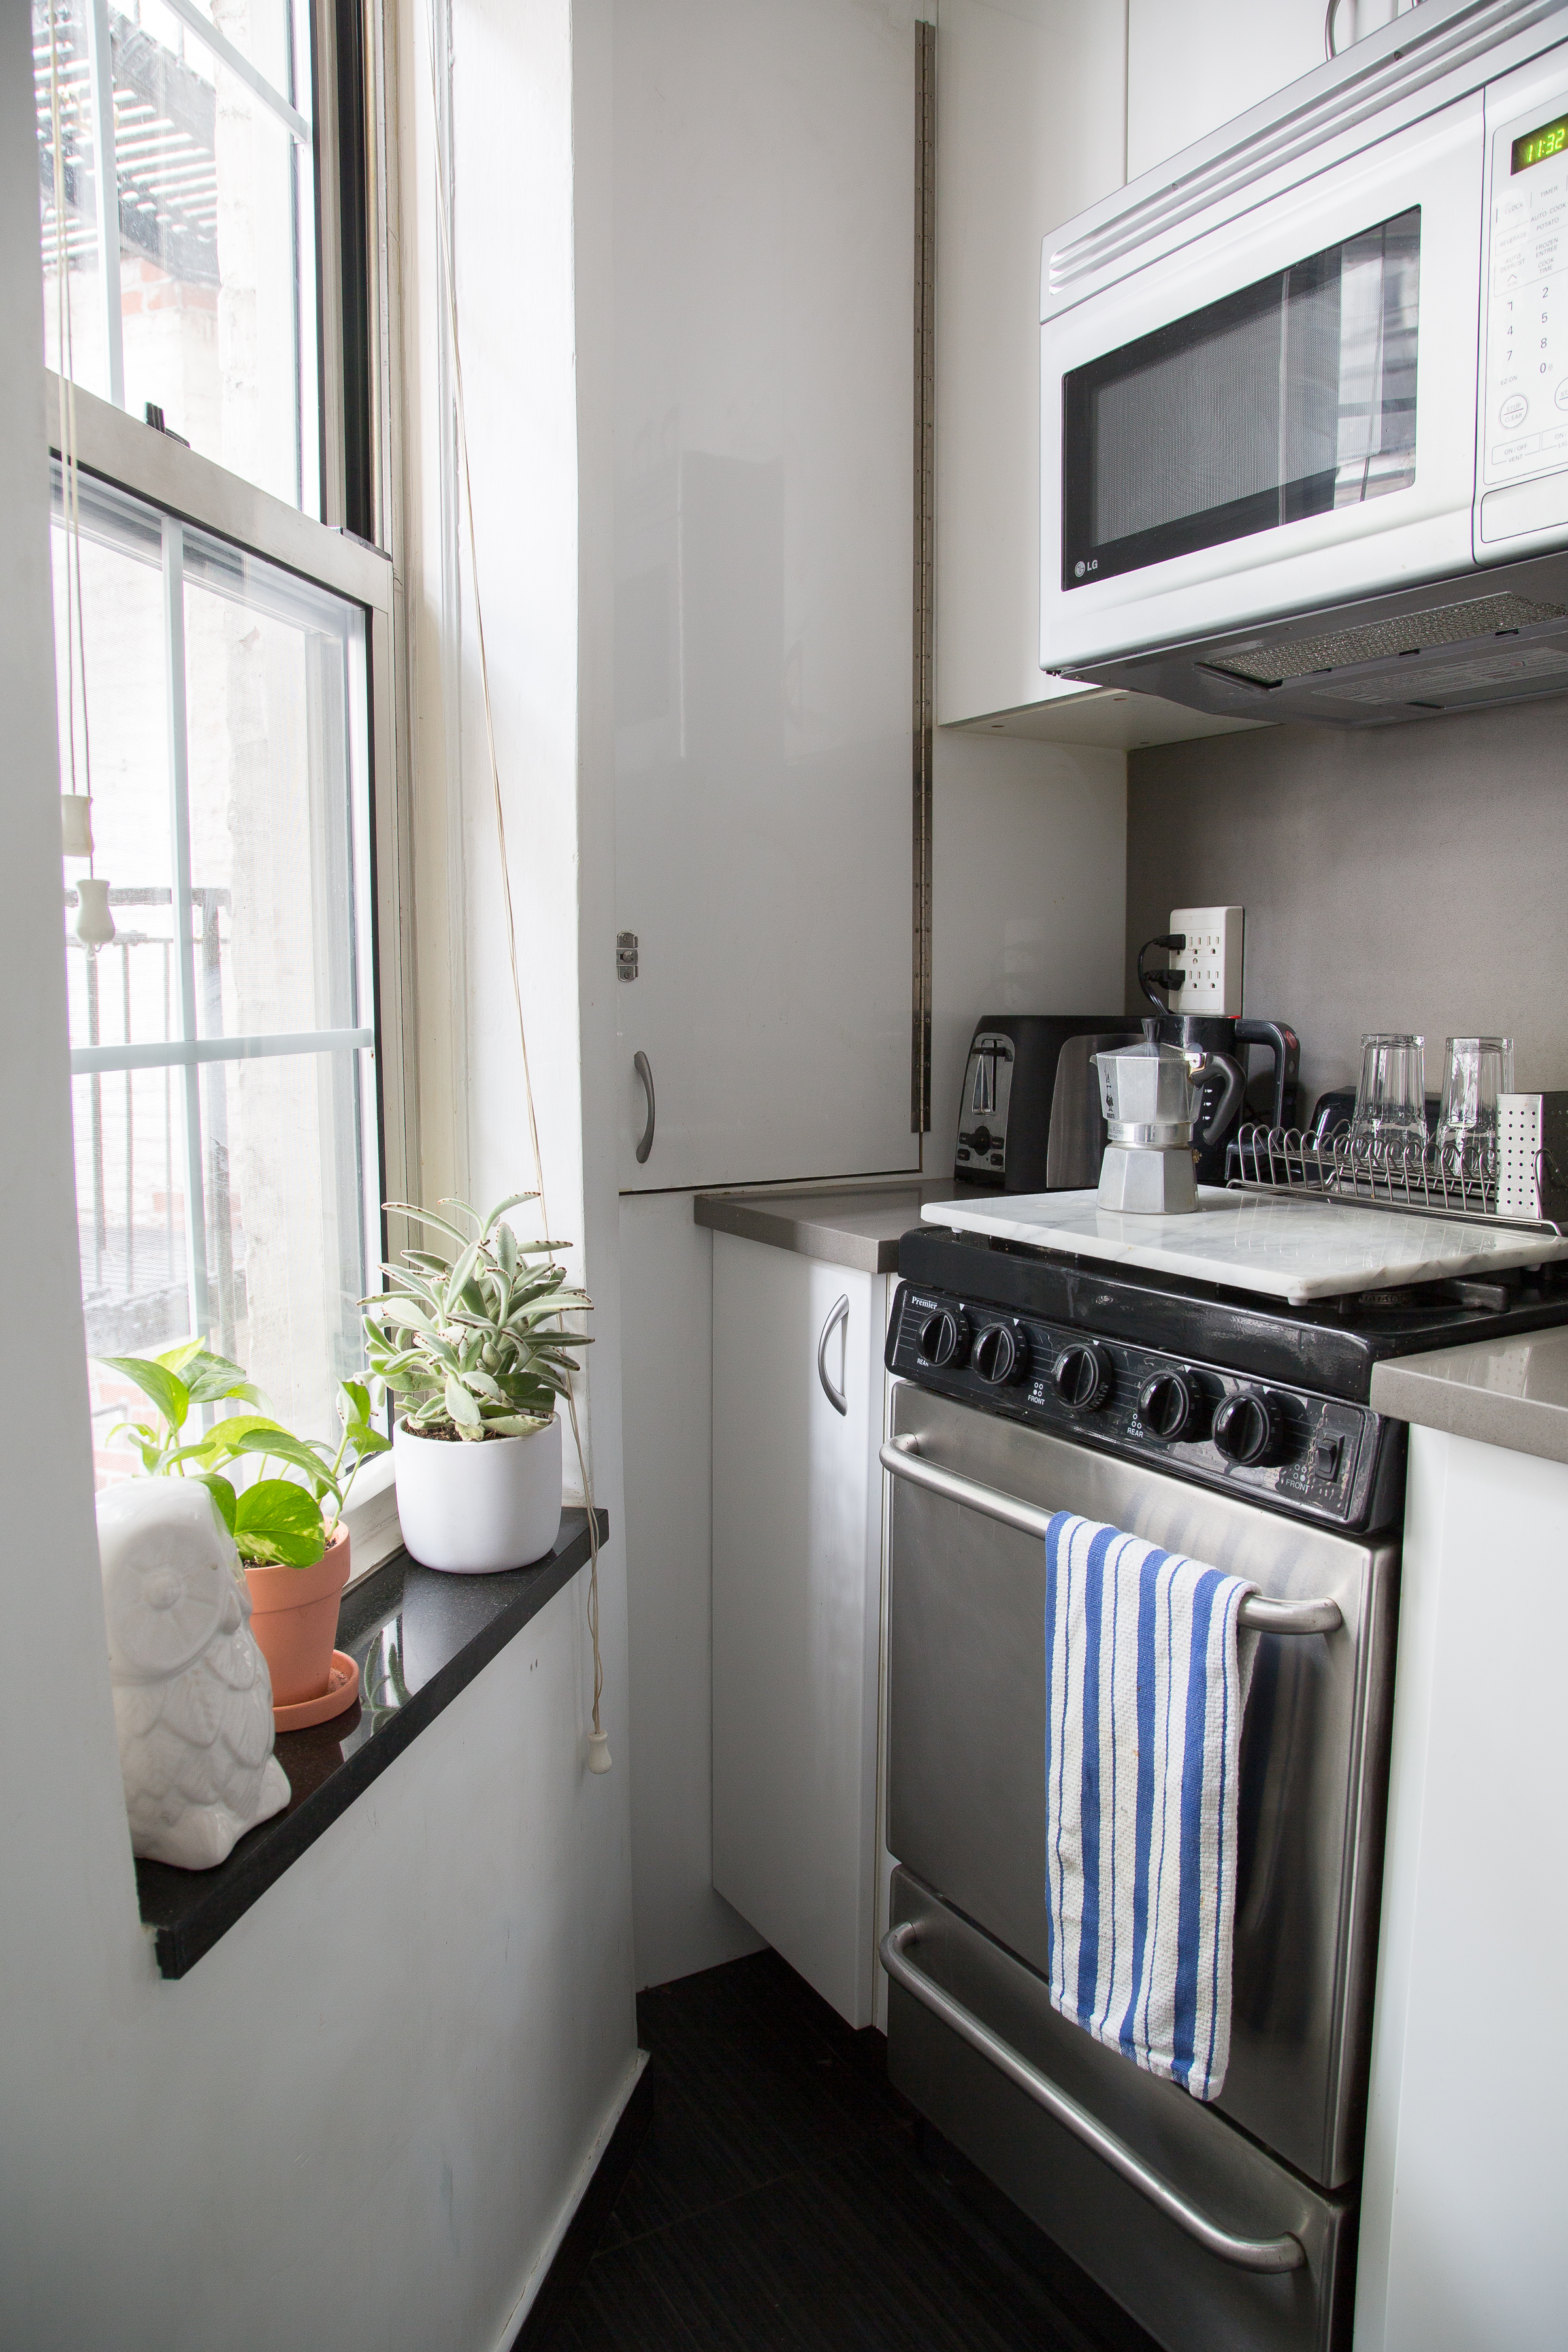 Smallest Kitchen In The World